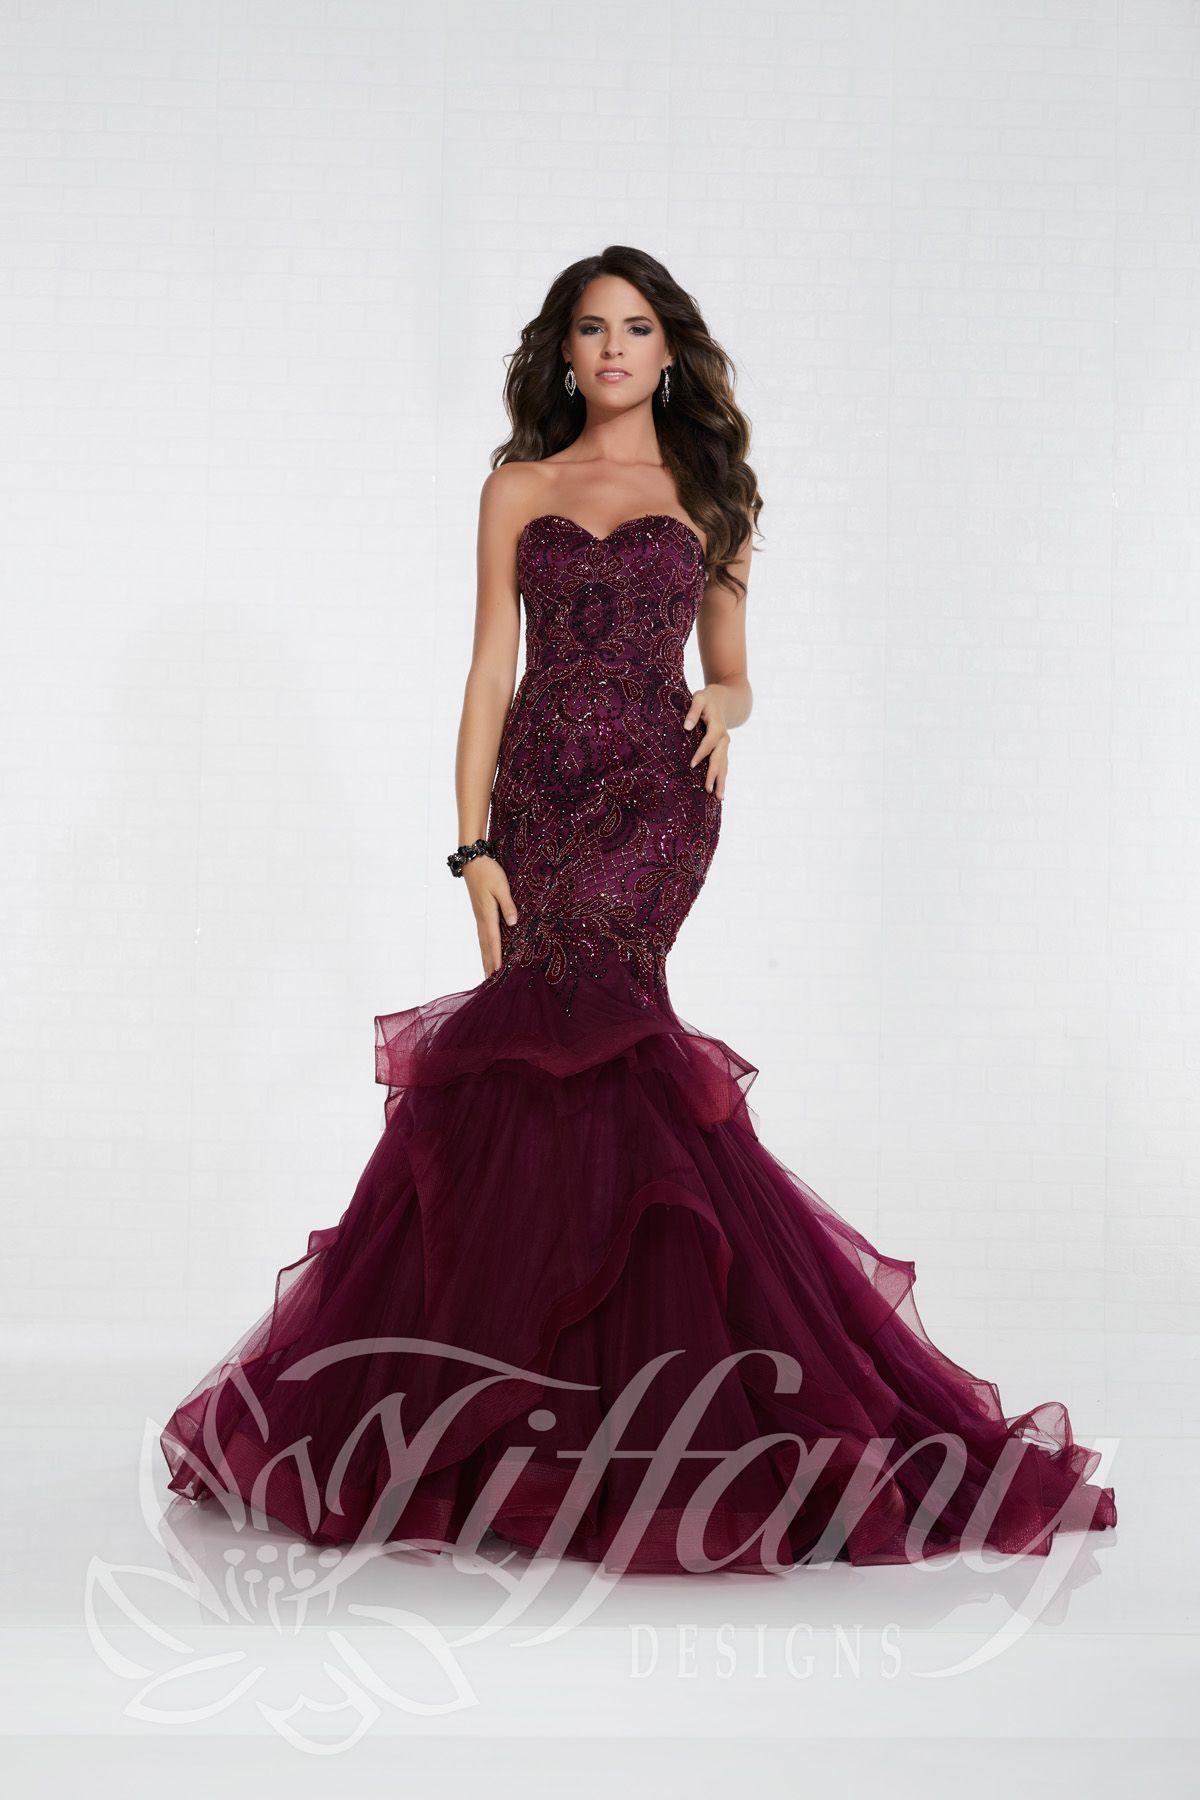 1d7093e4631 Looks We Love Tiffany 16296 - Mermaid Dresses